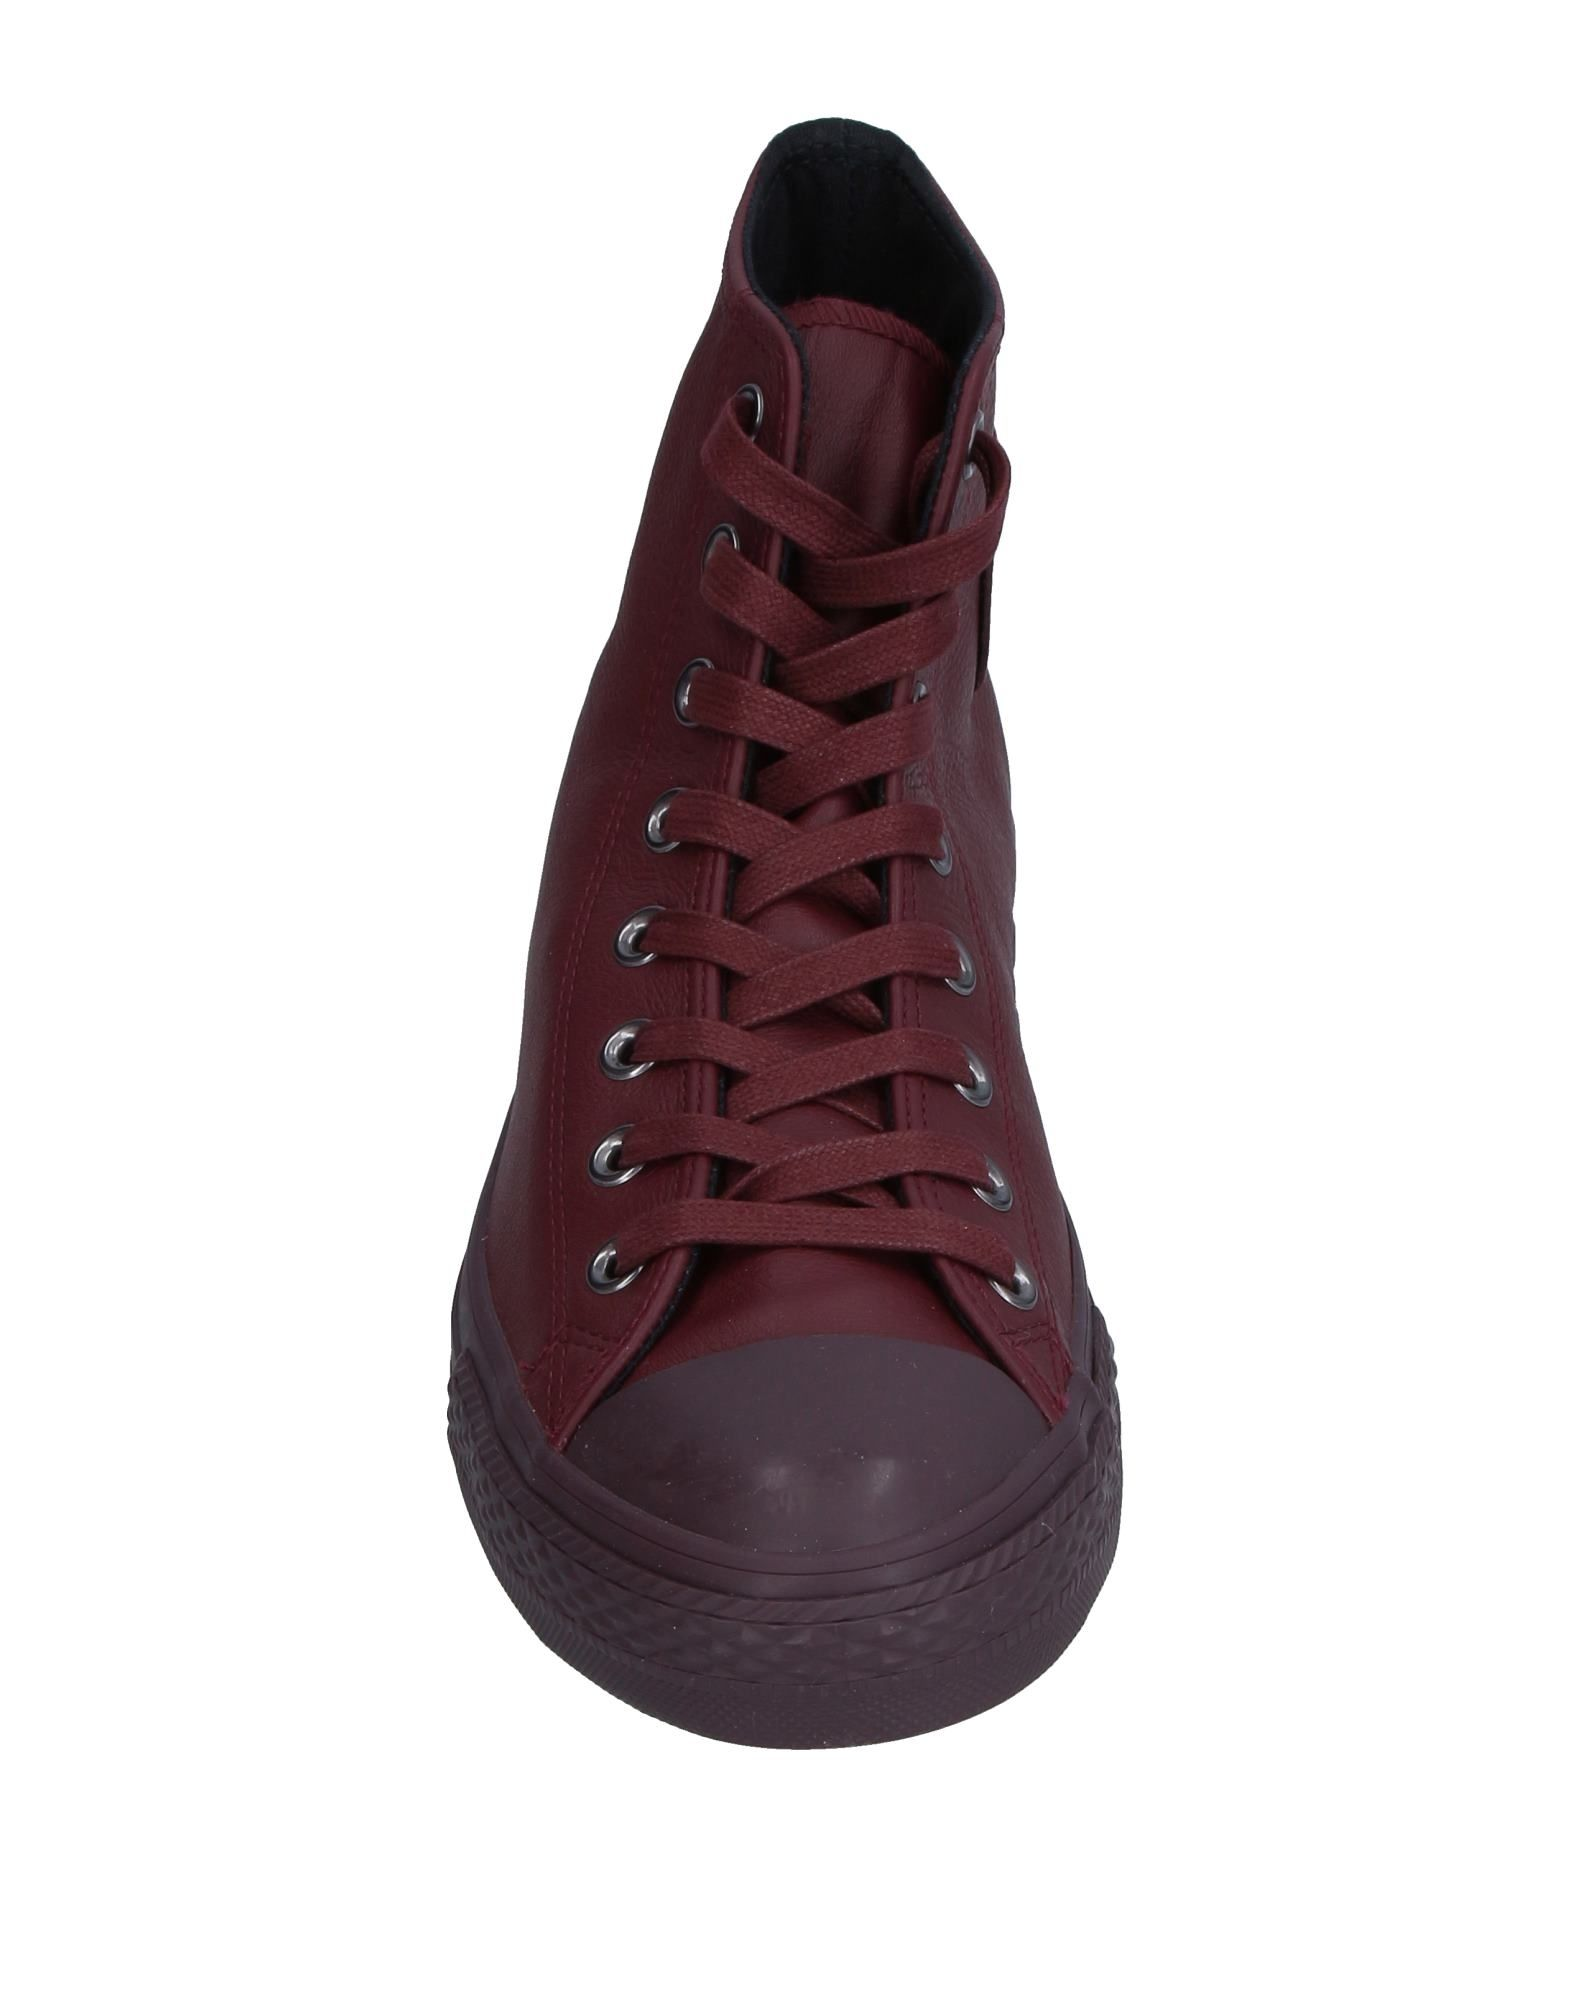 Rabatt echte Schuhe Herren Converse All Star Sneakers Herren Schuhe  11236677PR 39e5e6